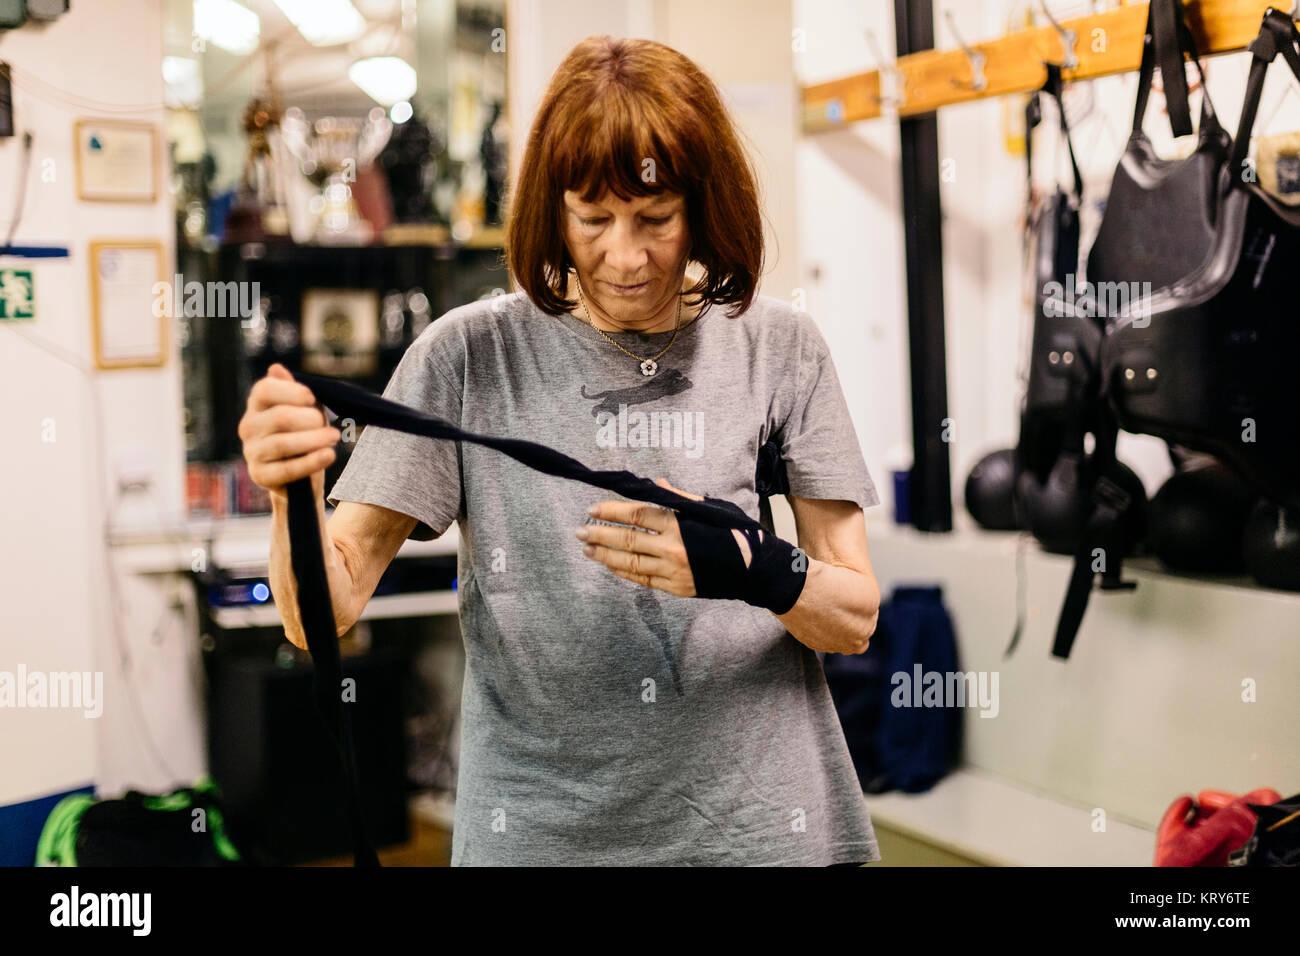 Senior woman preparing for boxing training - Stock Image